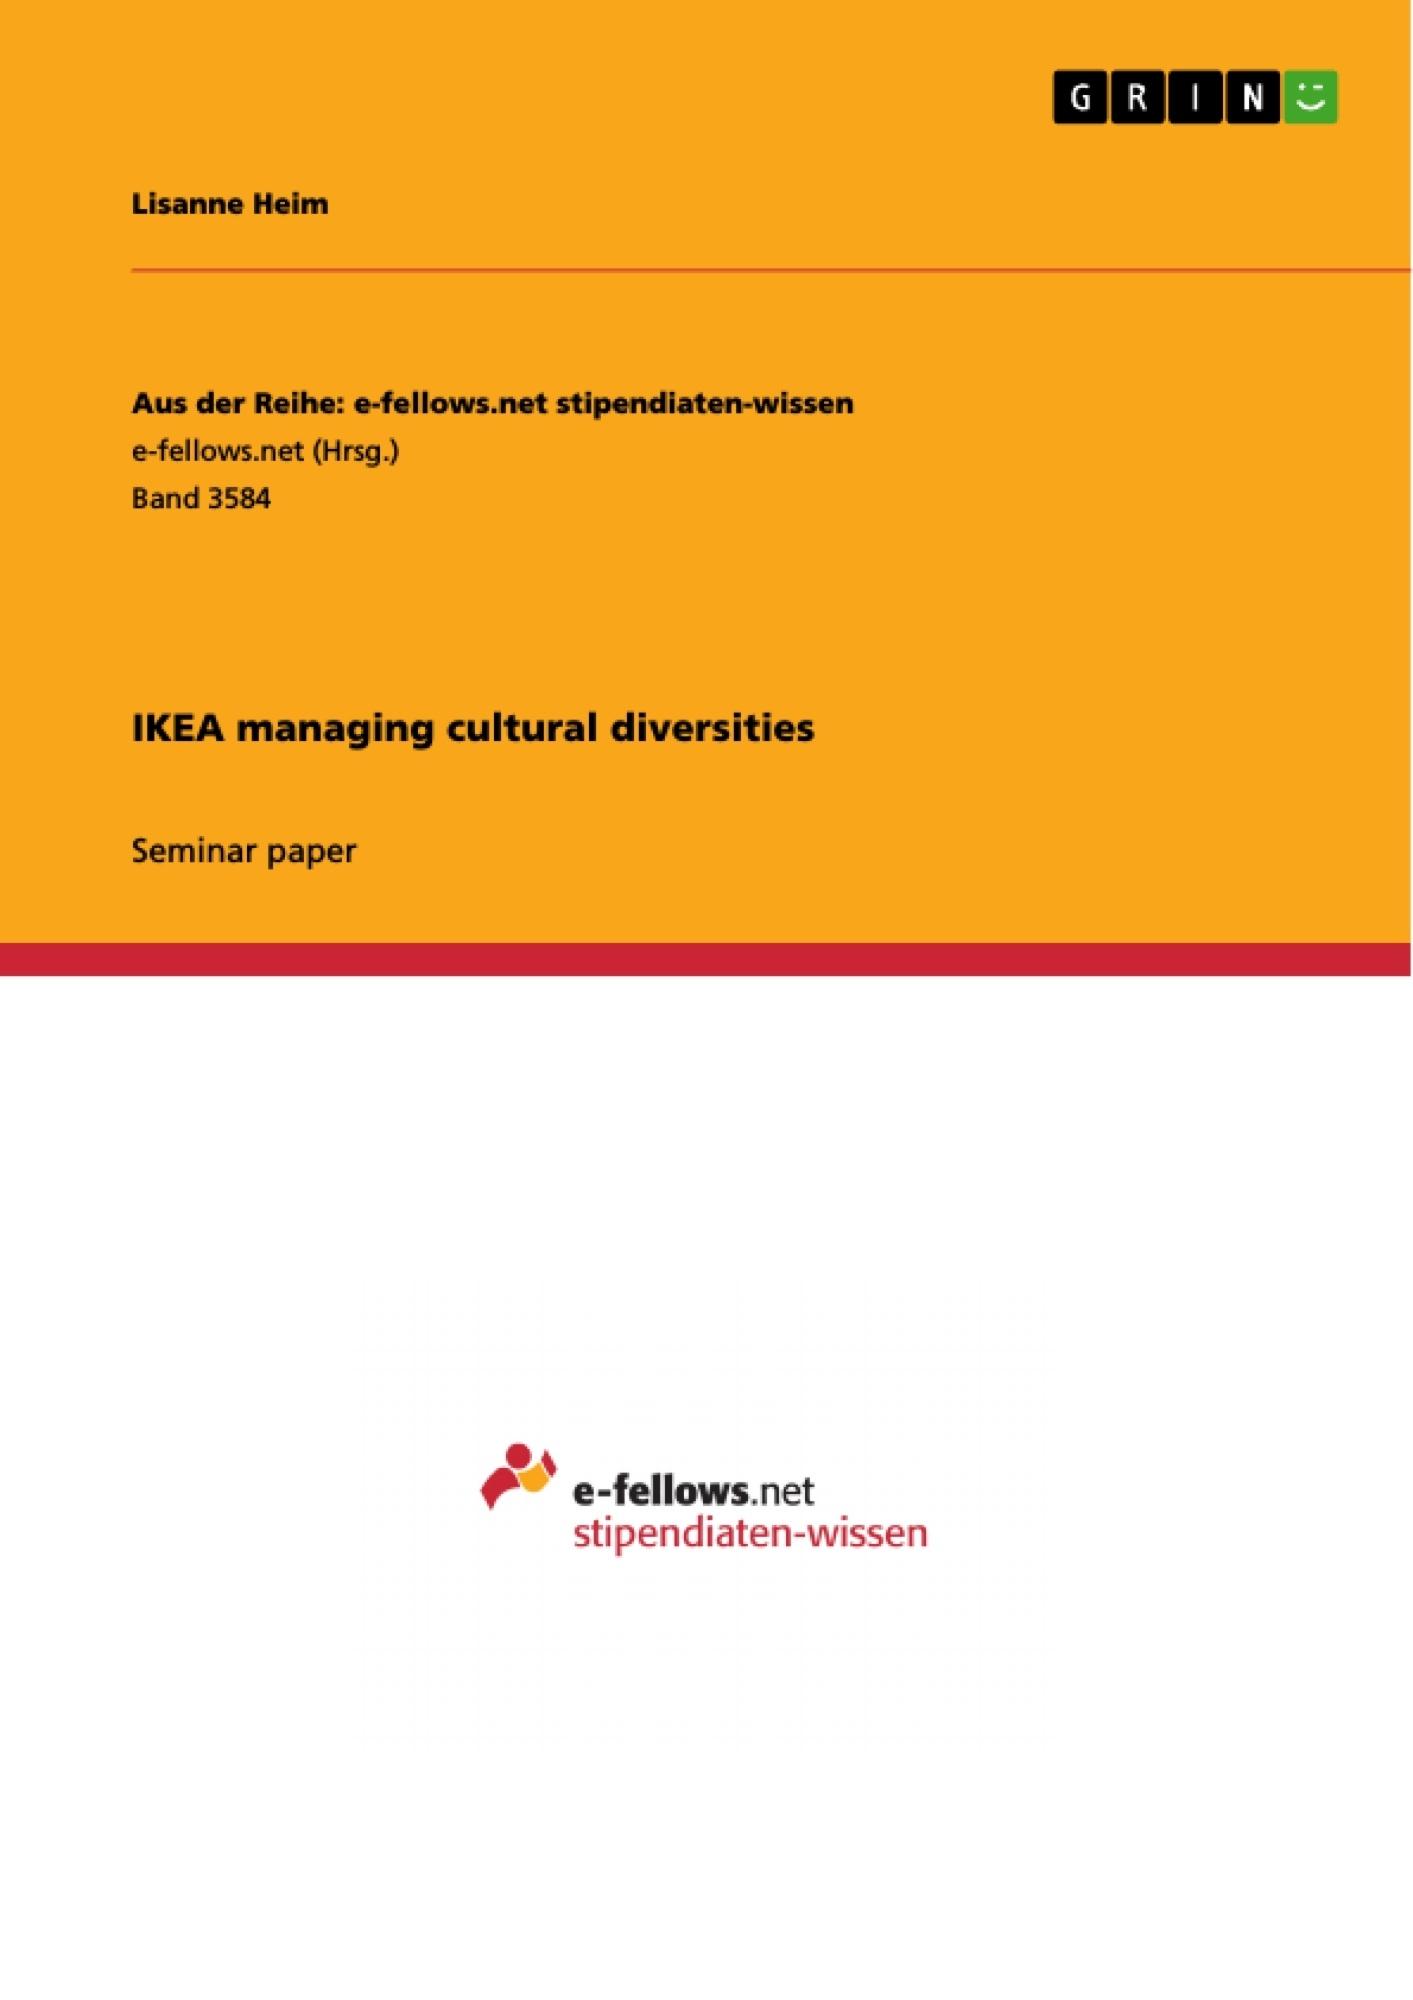 Title: IKEA managing cultural diversities